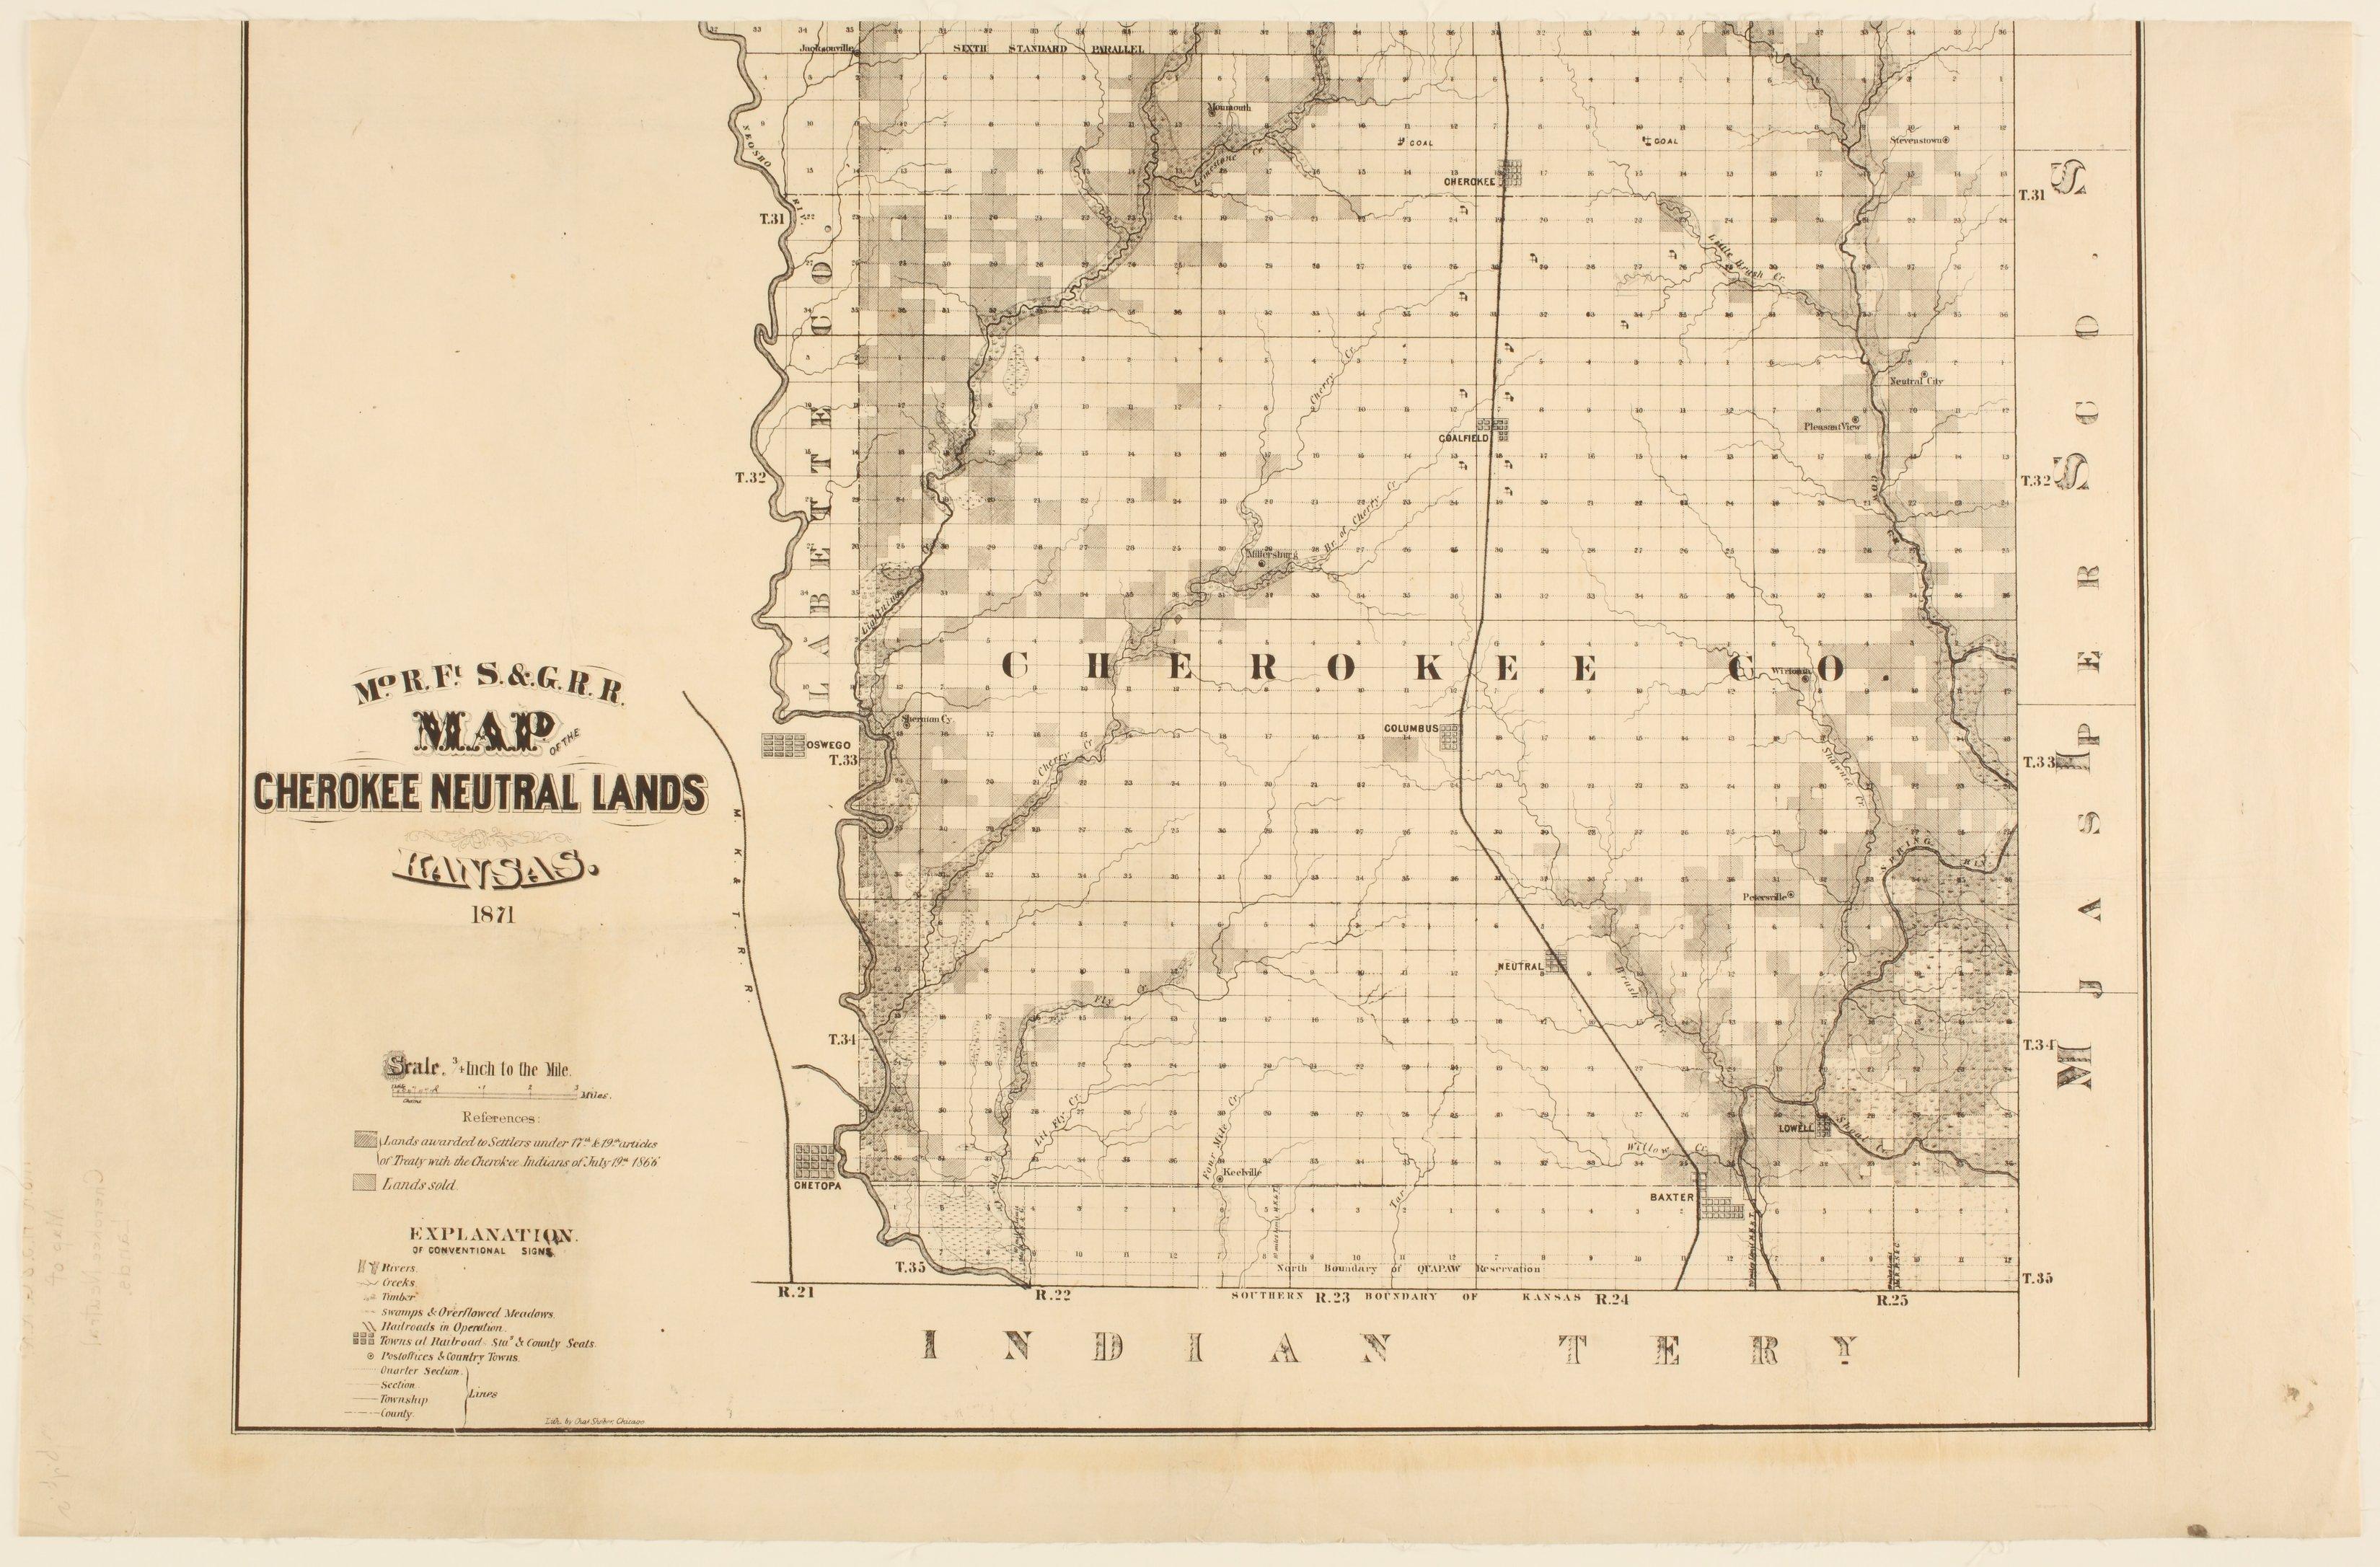 Missouri River, Fort Scott and Gulf Railroad map of the Cherokee neutral lands, Kansas - 1